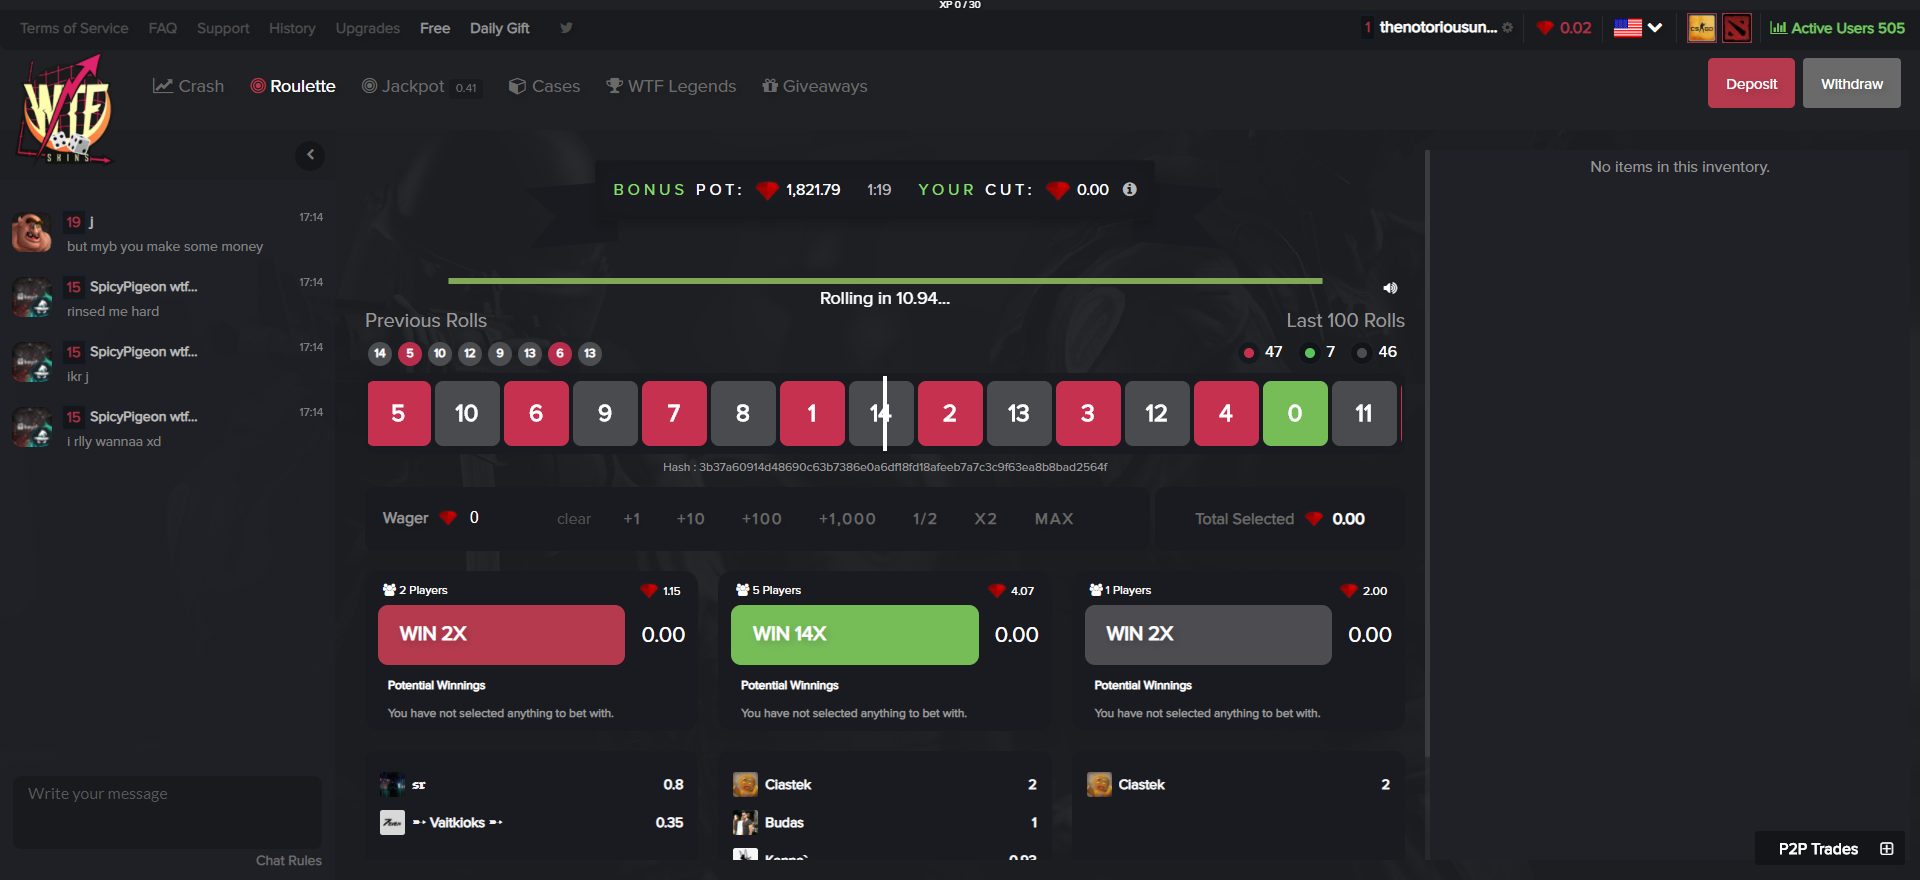 CSGO Gambling Sites WTFSkins